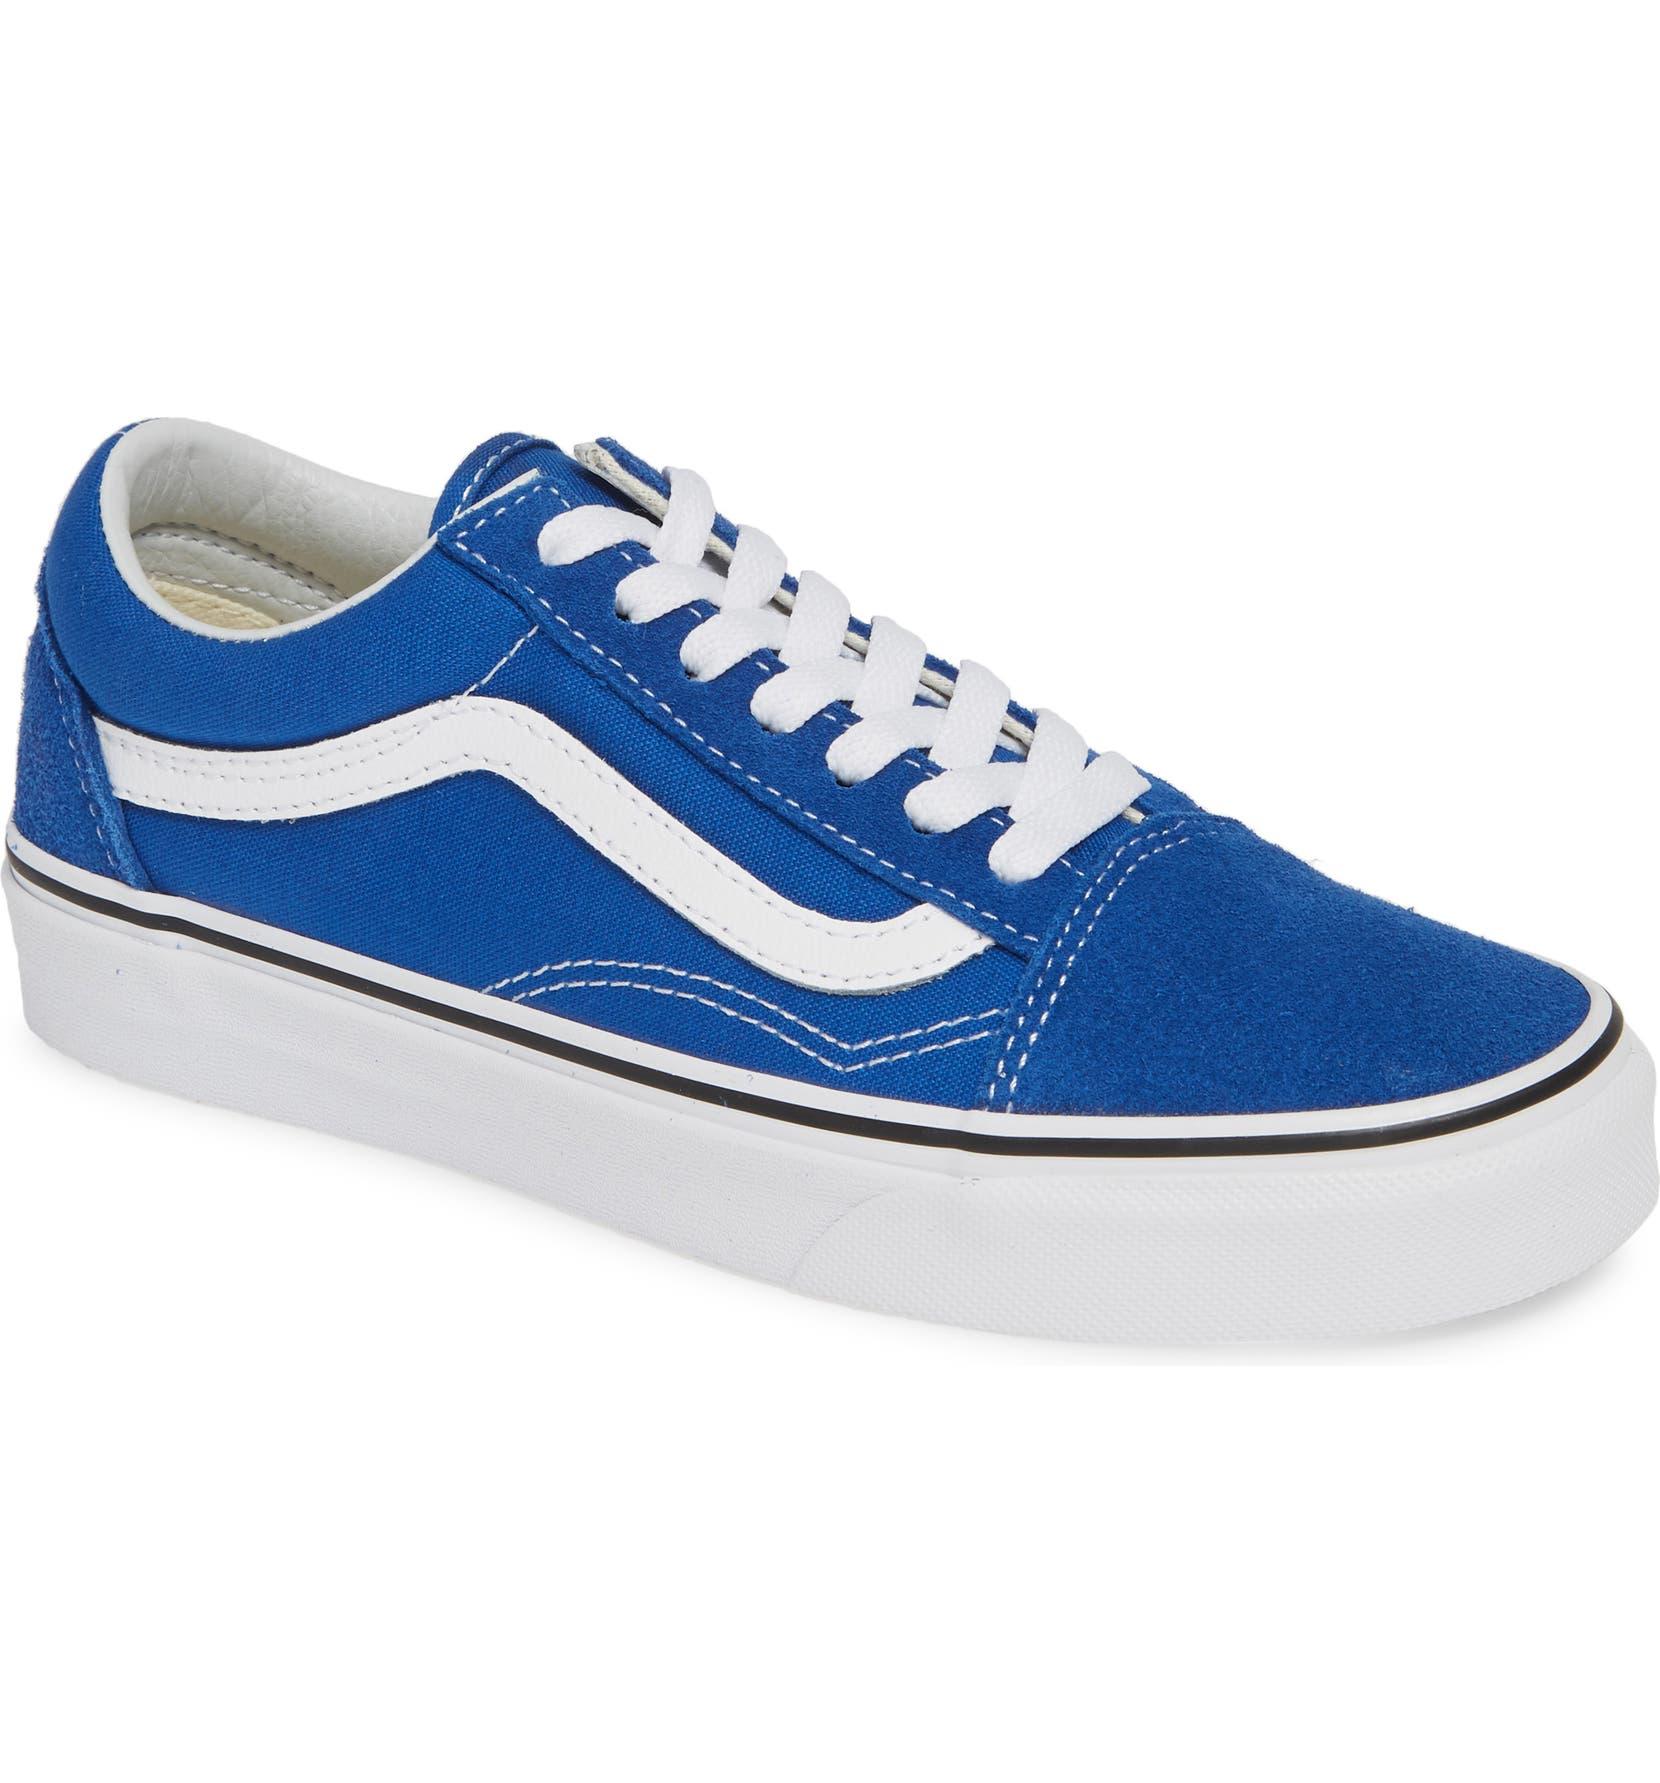 a6e2417660f73 Vans Old Skool Sneaker (Women) | Nordstrom